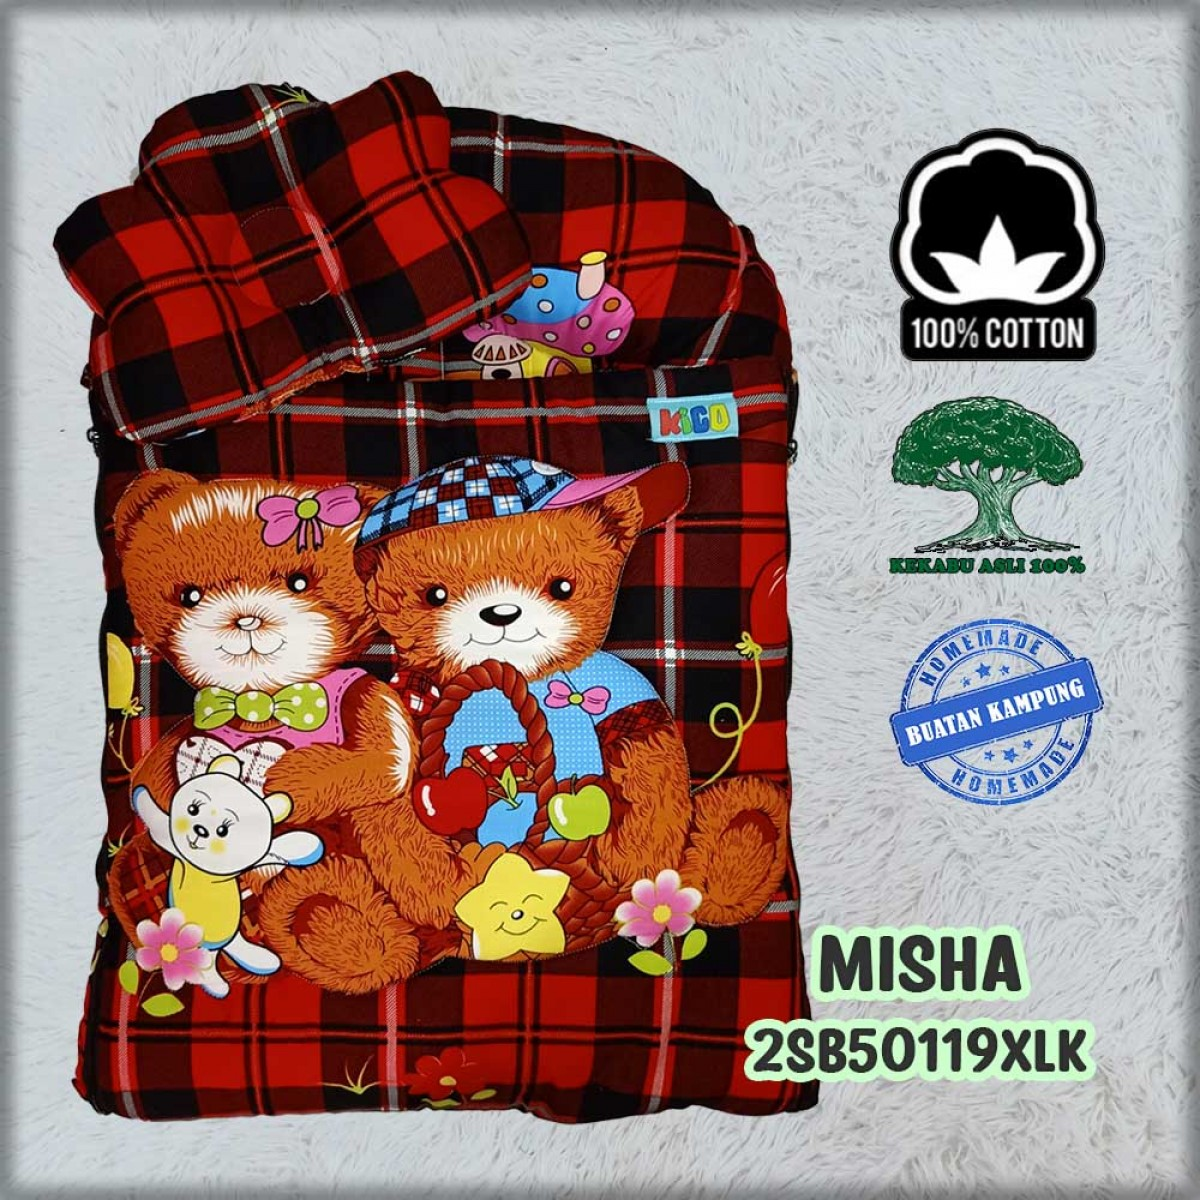 Misha - Kico Baby Center